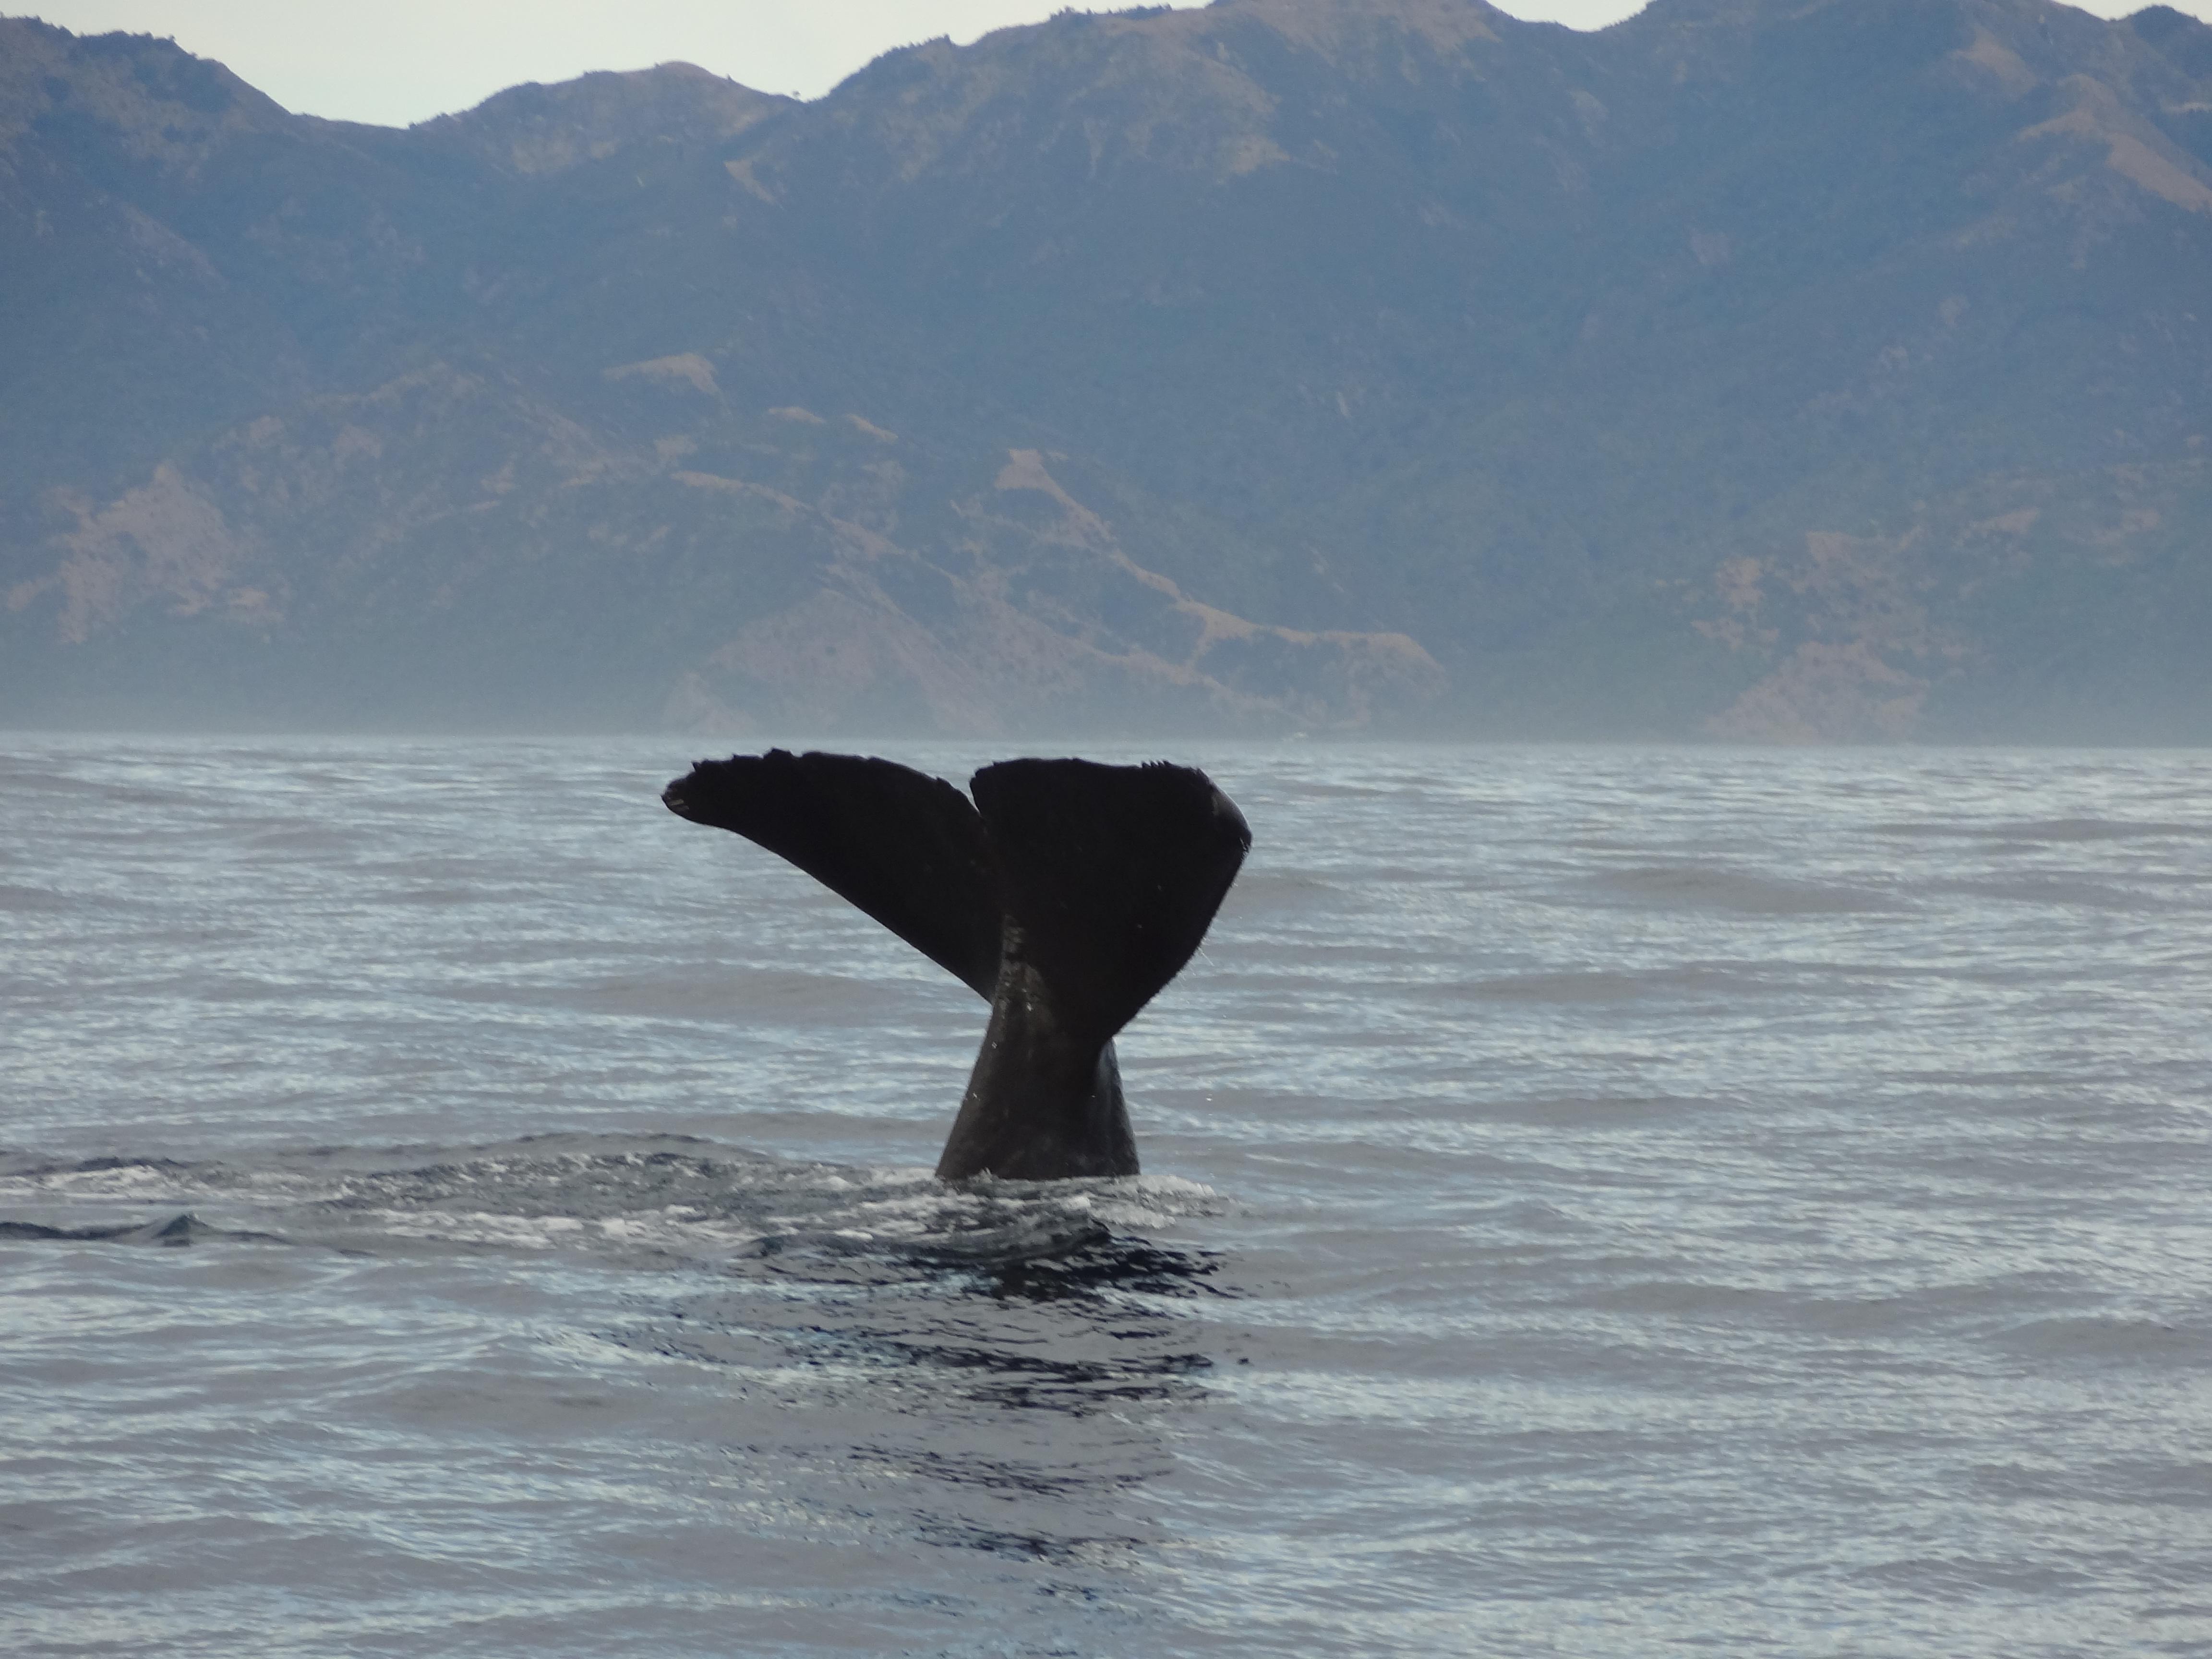 A whale off the coast of Kaikoura